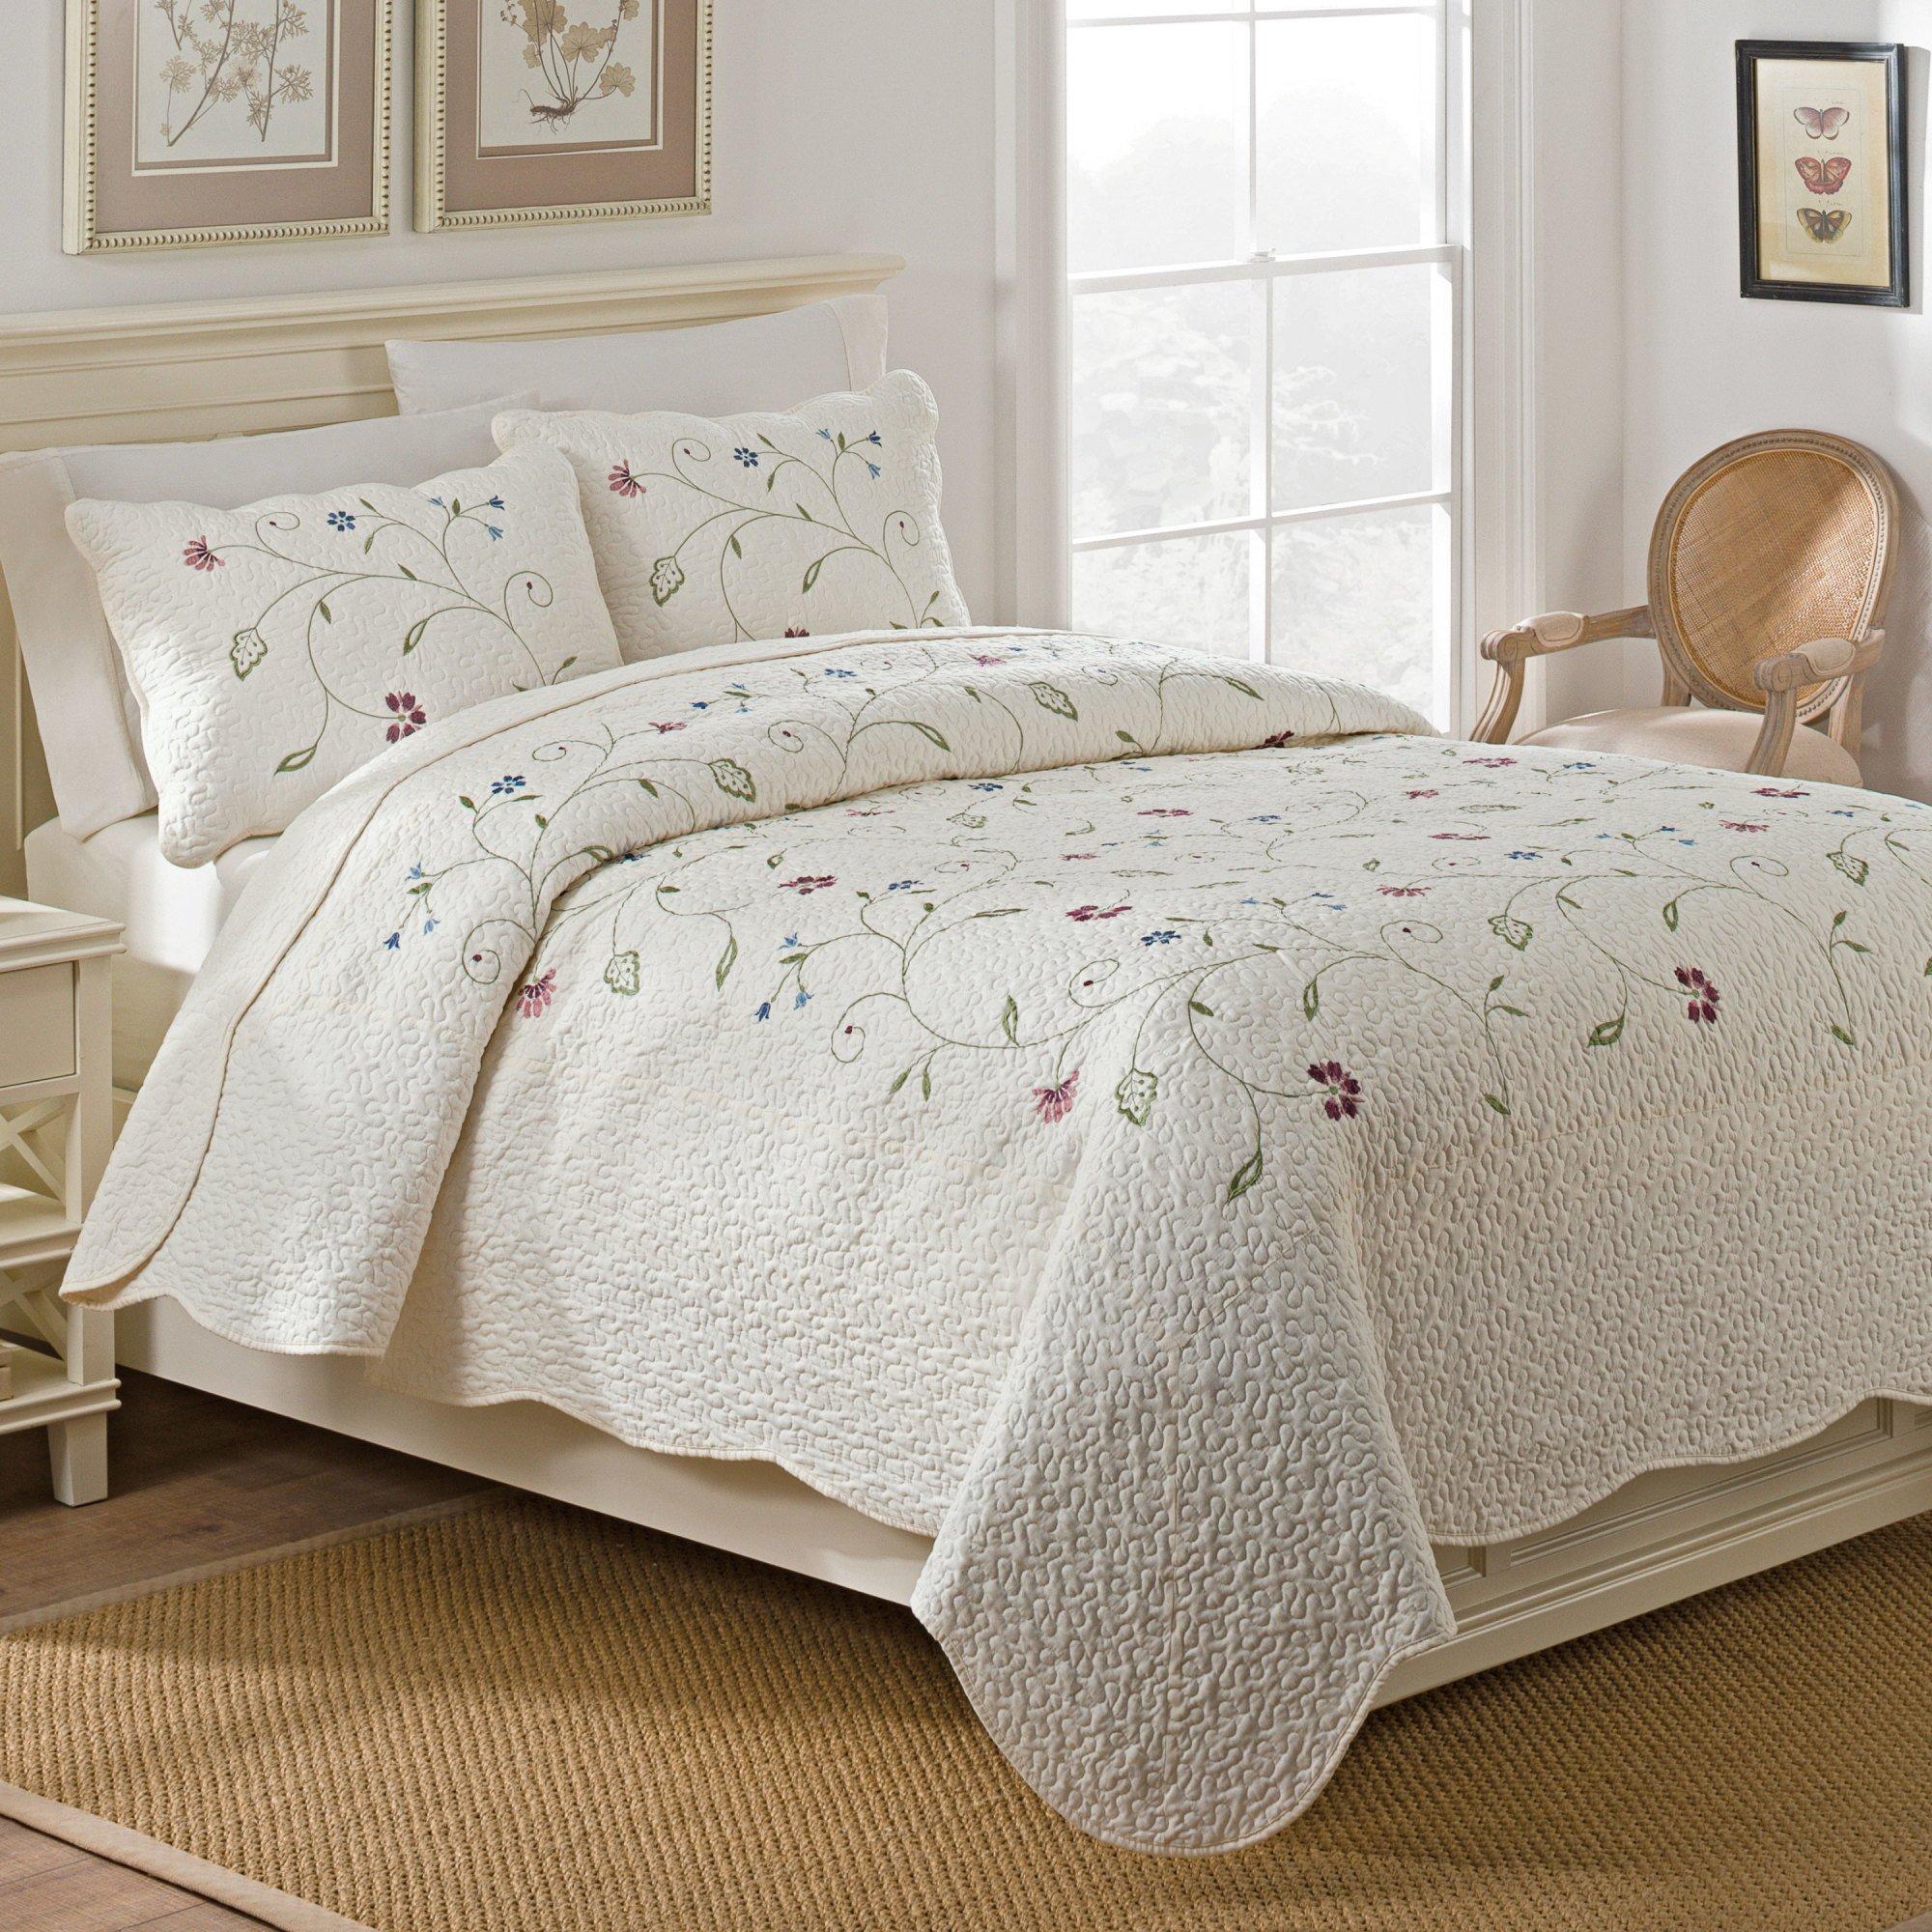 WestPoint Home Sophia Quilt Set, Full/Queen, Ivory, 3 Piece